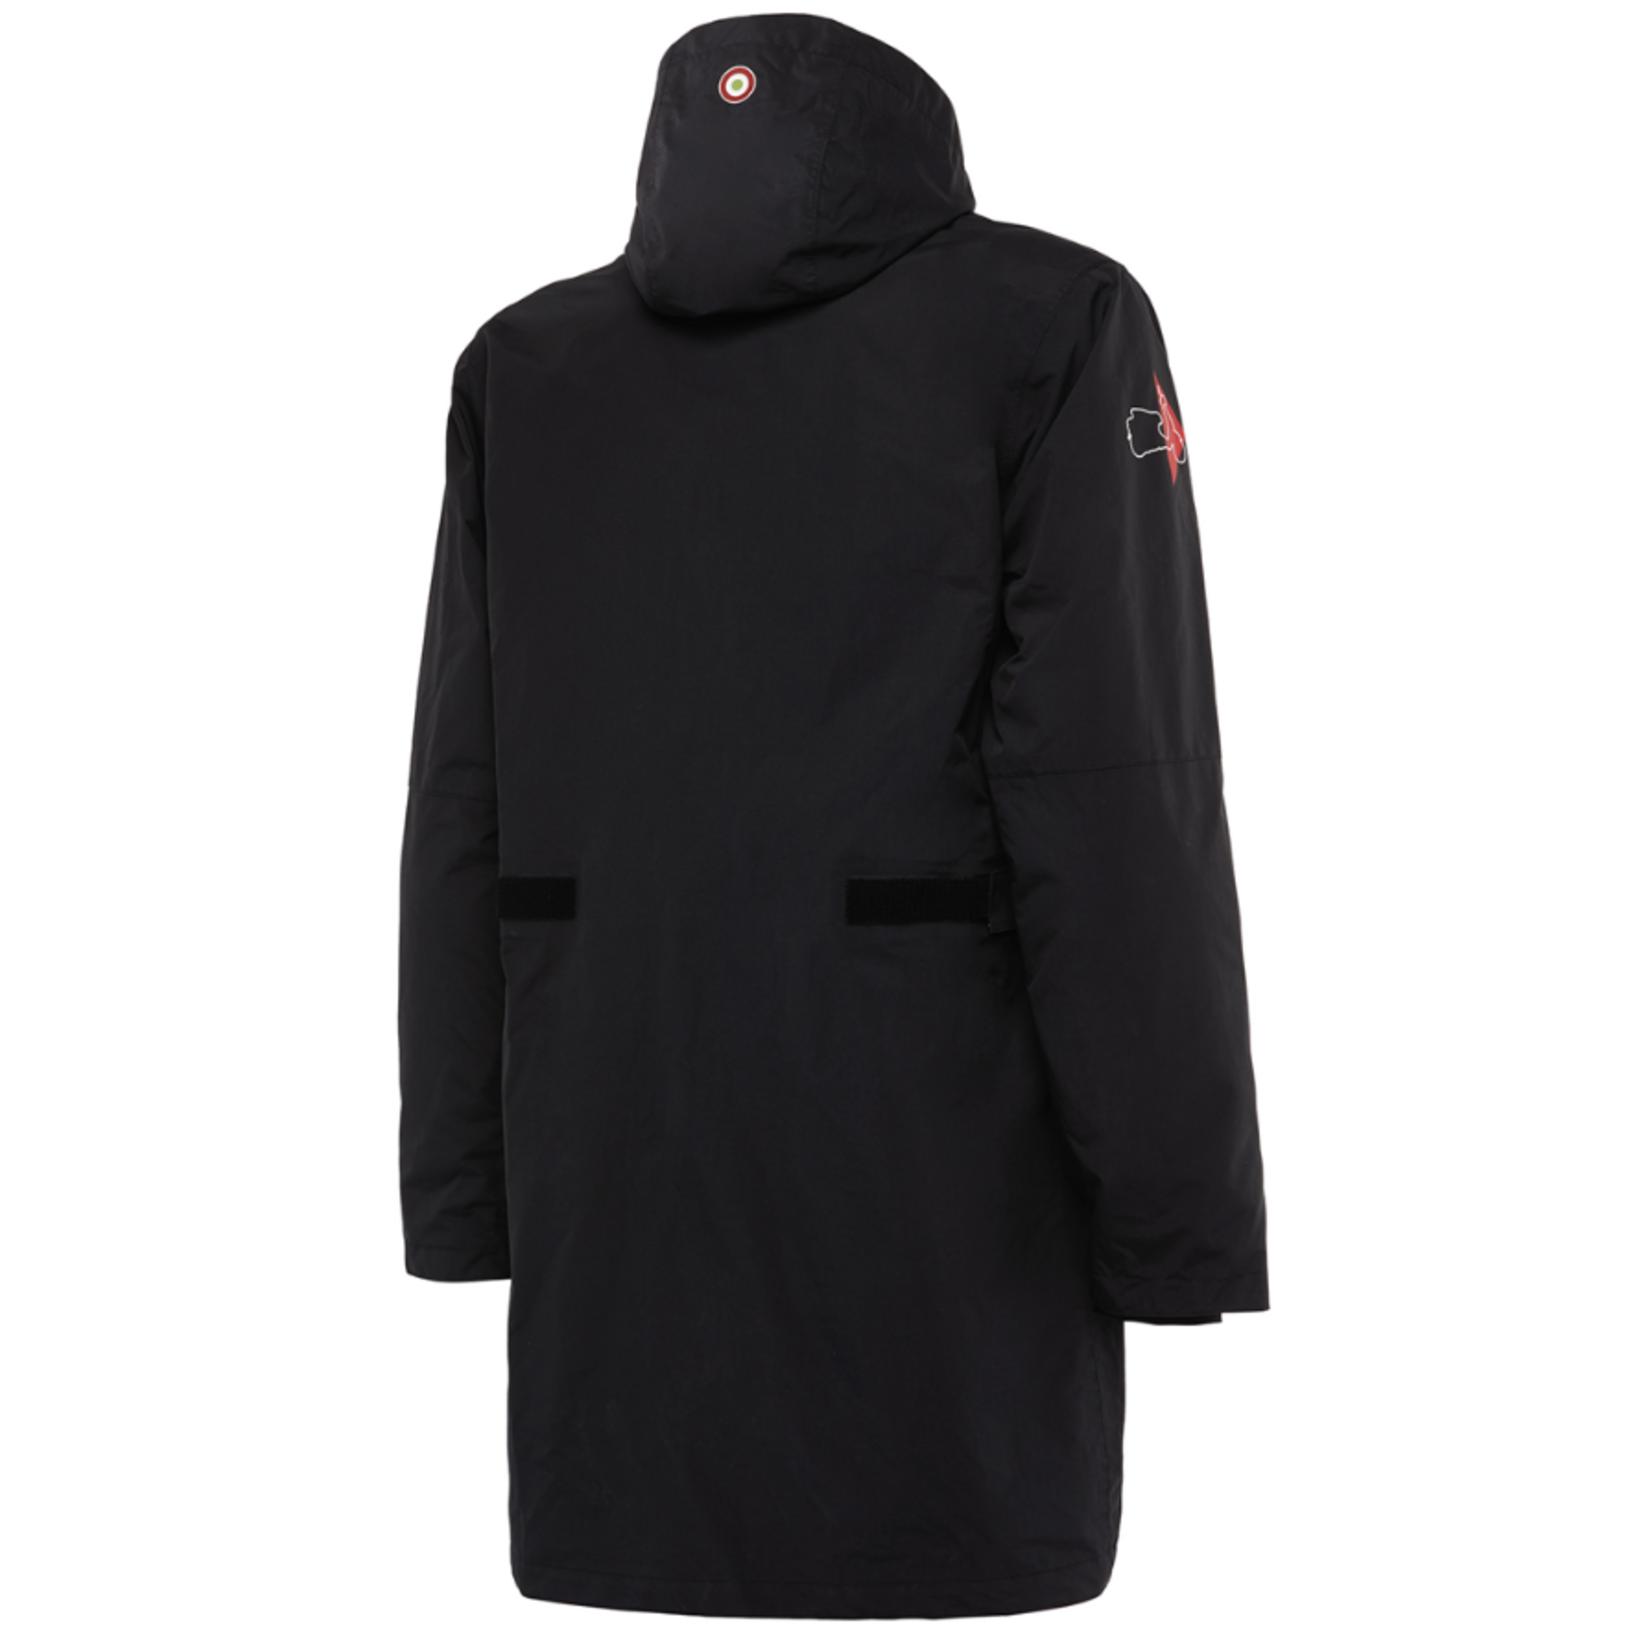 Lifestyle Jacket, Vespa Modernist Hooded Trench